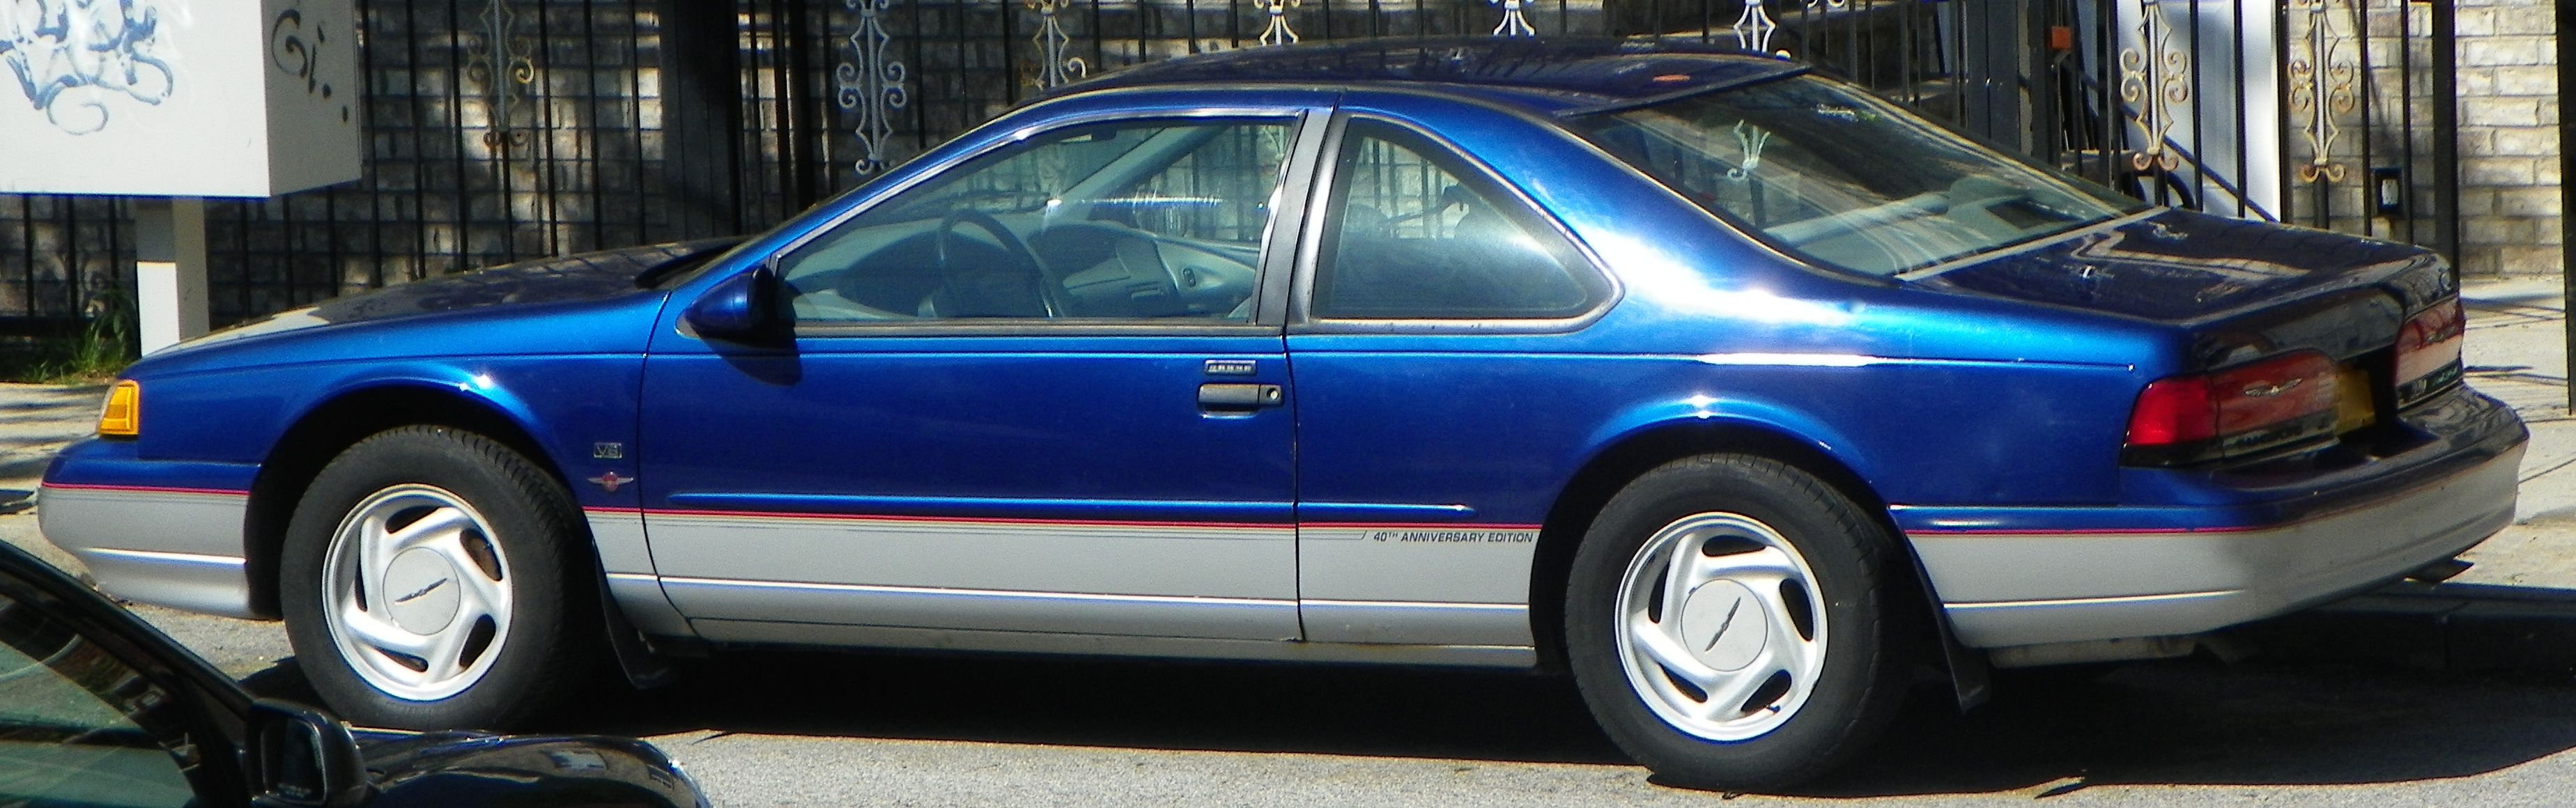 My 1995 Ford Thunderbird LX 40th Anniversary Edition 297